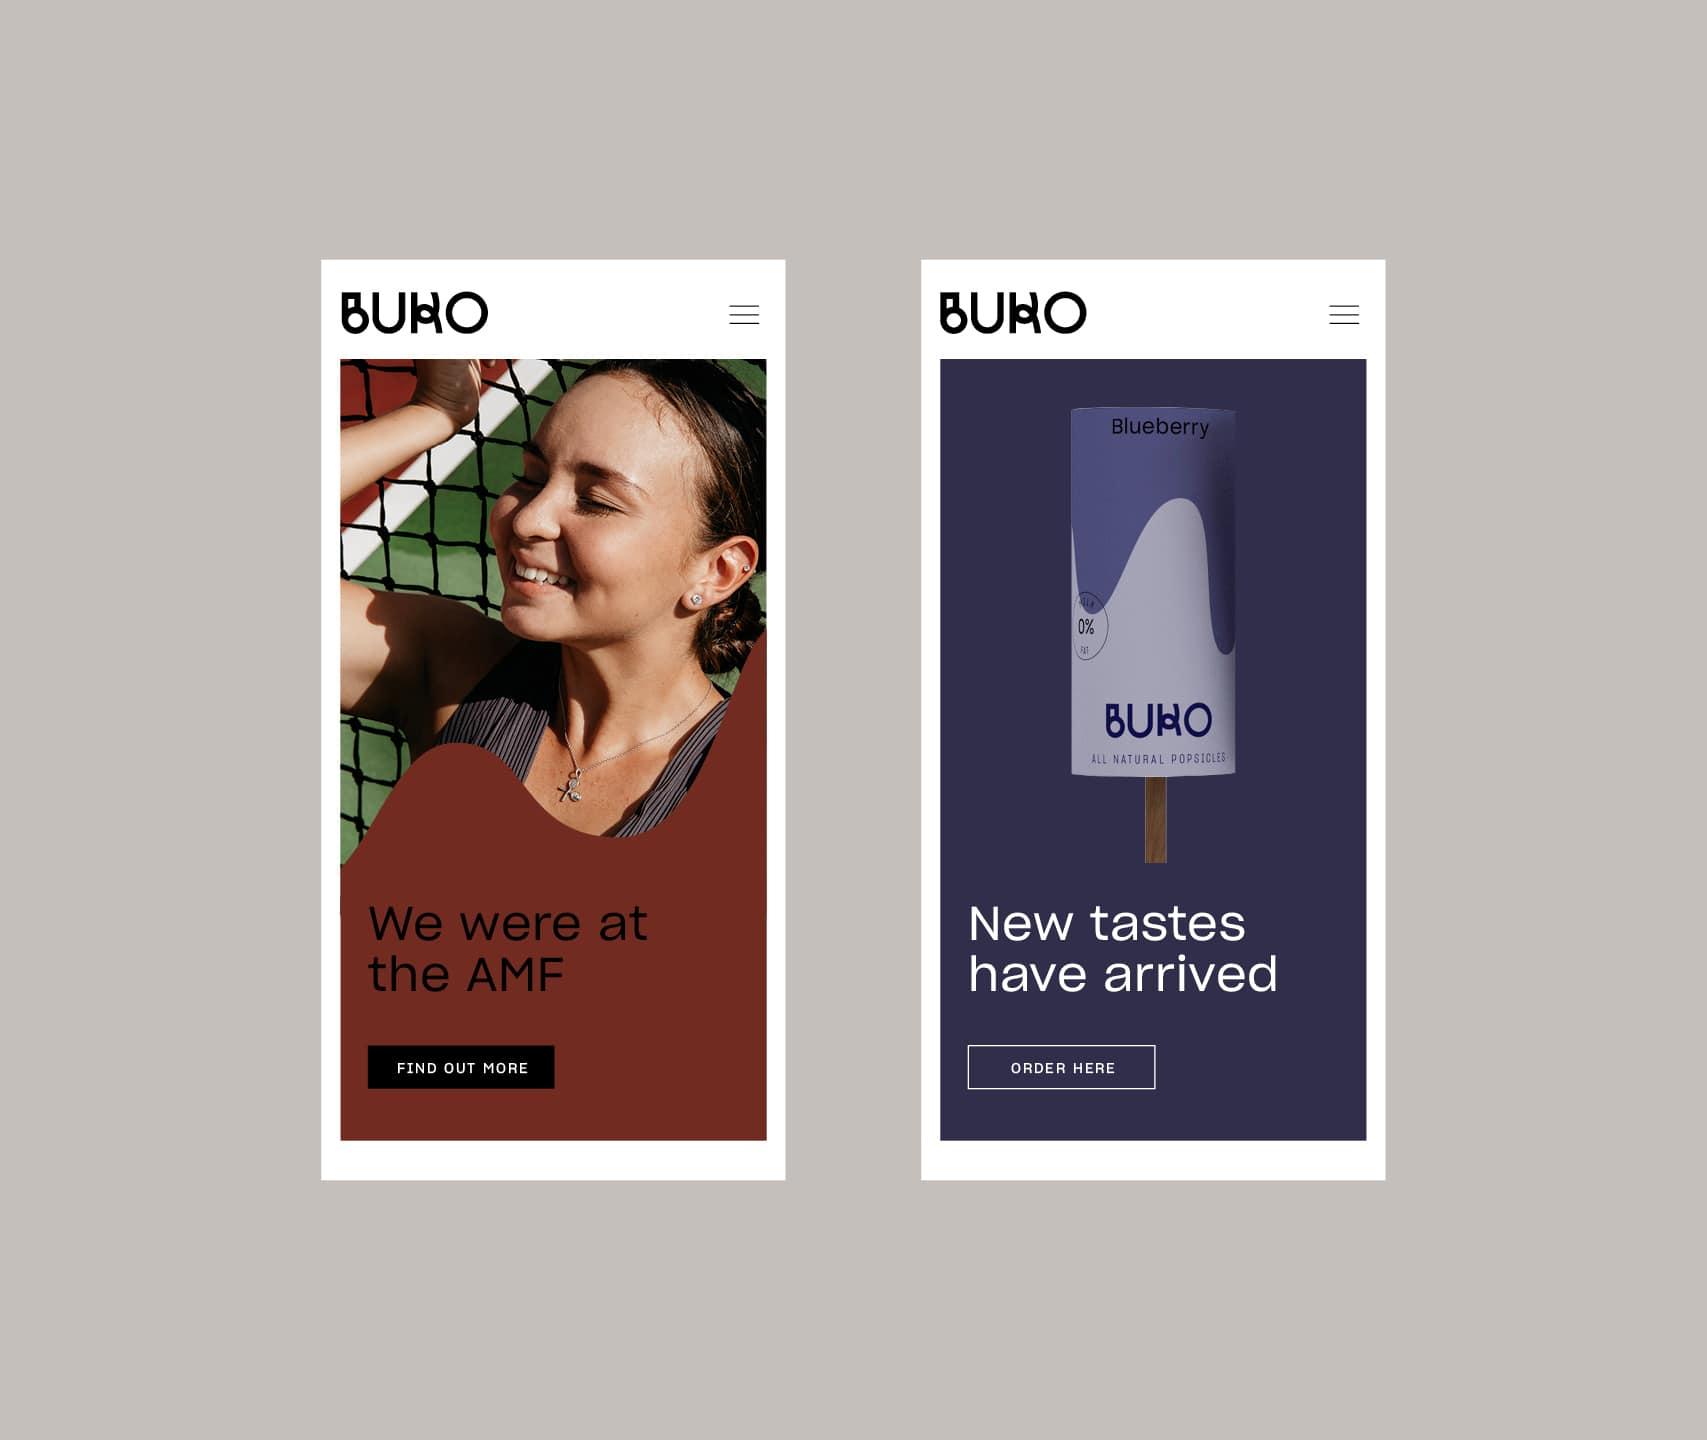 mantik-digital-creative-agency-branding-popsicle-icecream-packaging-experience-web-design-development12-min